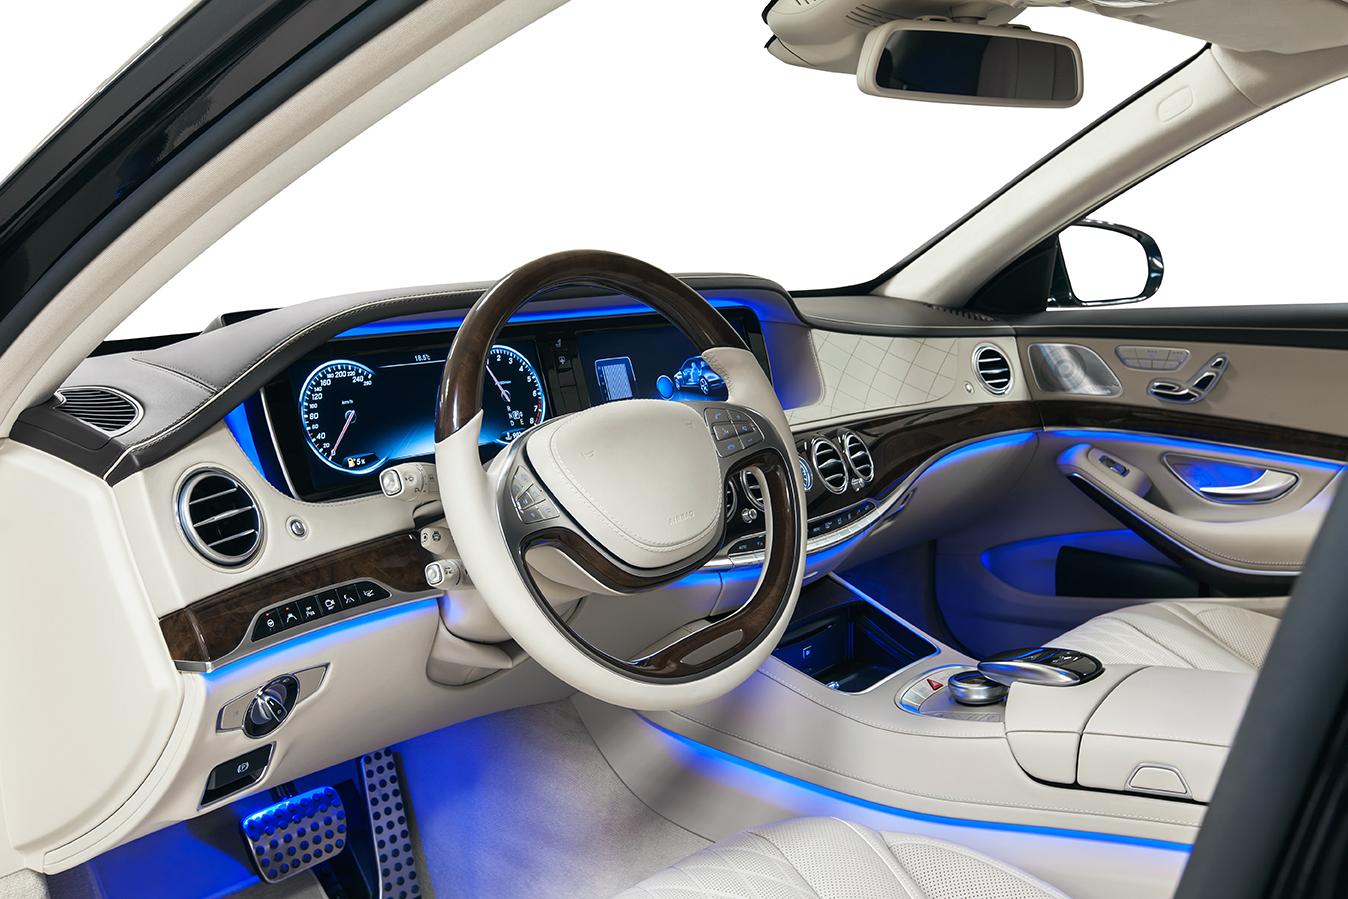 & Melexis chip improves car cabin lighting